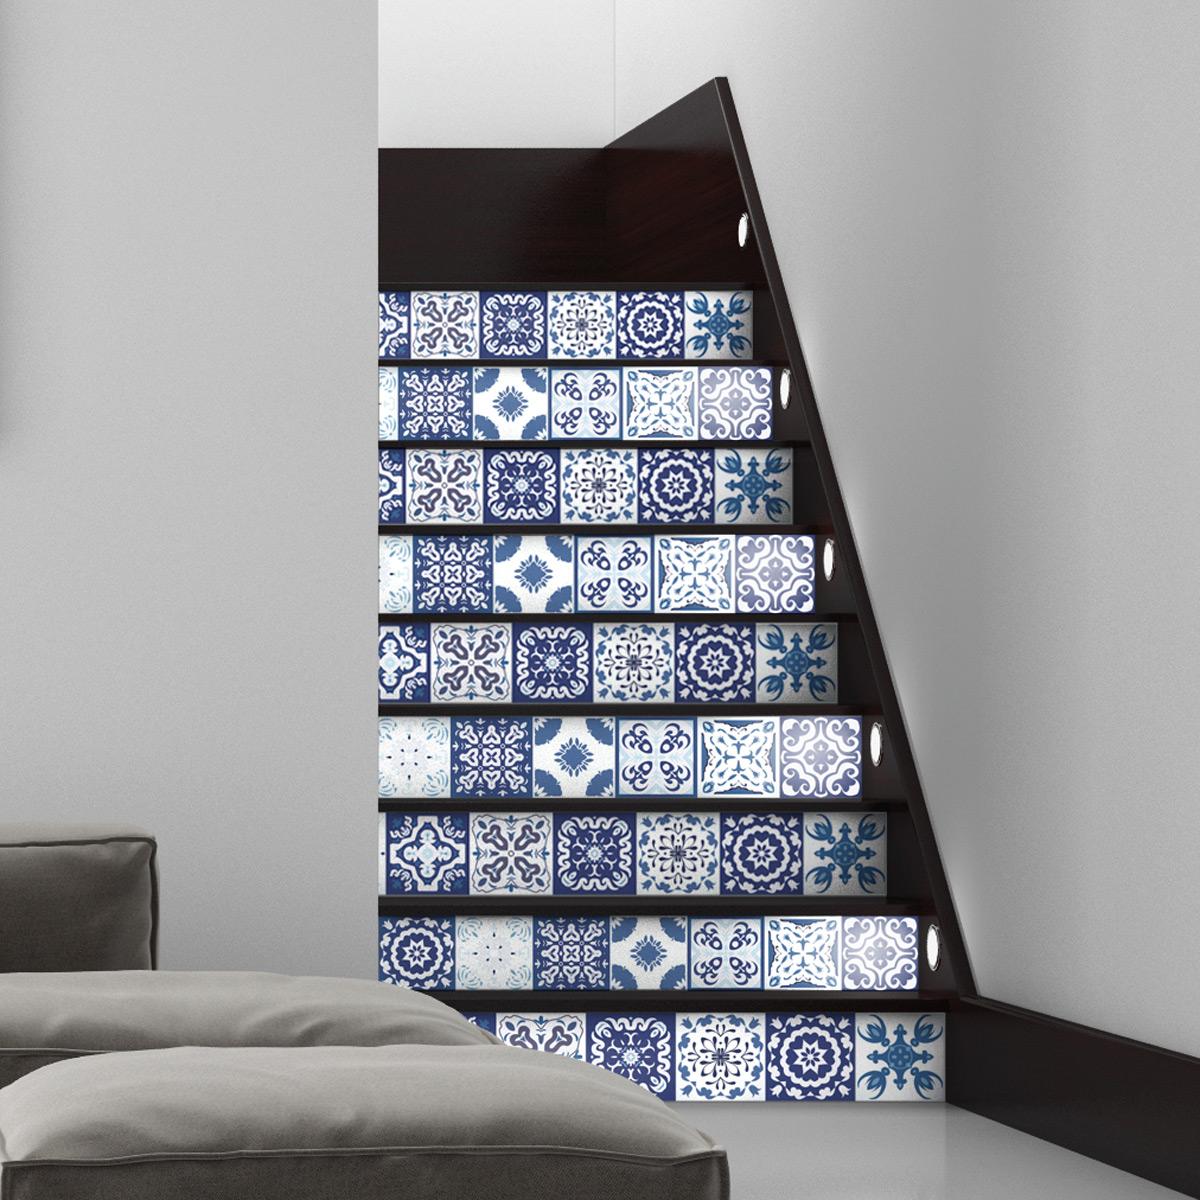 escalier ciment d sign carreaux. Black Bedroom Furniture Sets. Home Design Ideas